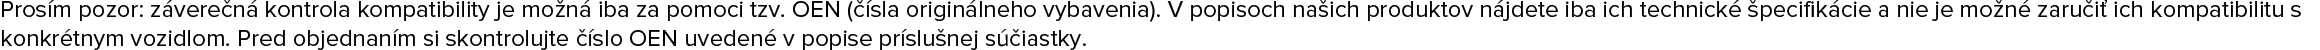 MANN-FILTER 11 42 7 805 978, 1109 AY, 1109 T3, 1109 Y2, 1109 Z6 Olejový filter